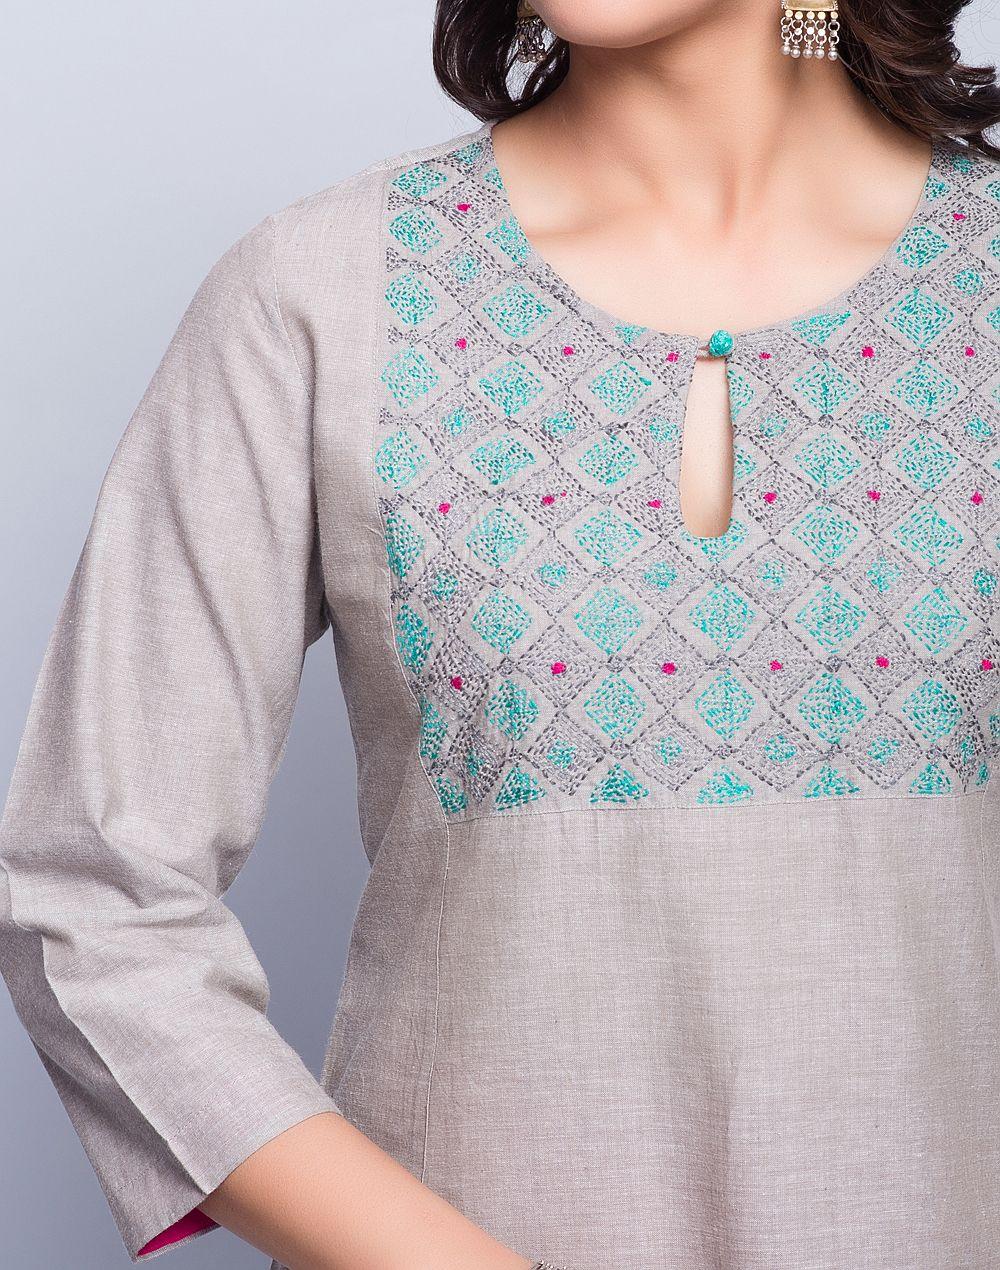 Cotton ChambrayPanelledSujni EmbroideredRound Neck3Q SleevesHand ...